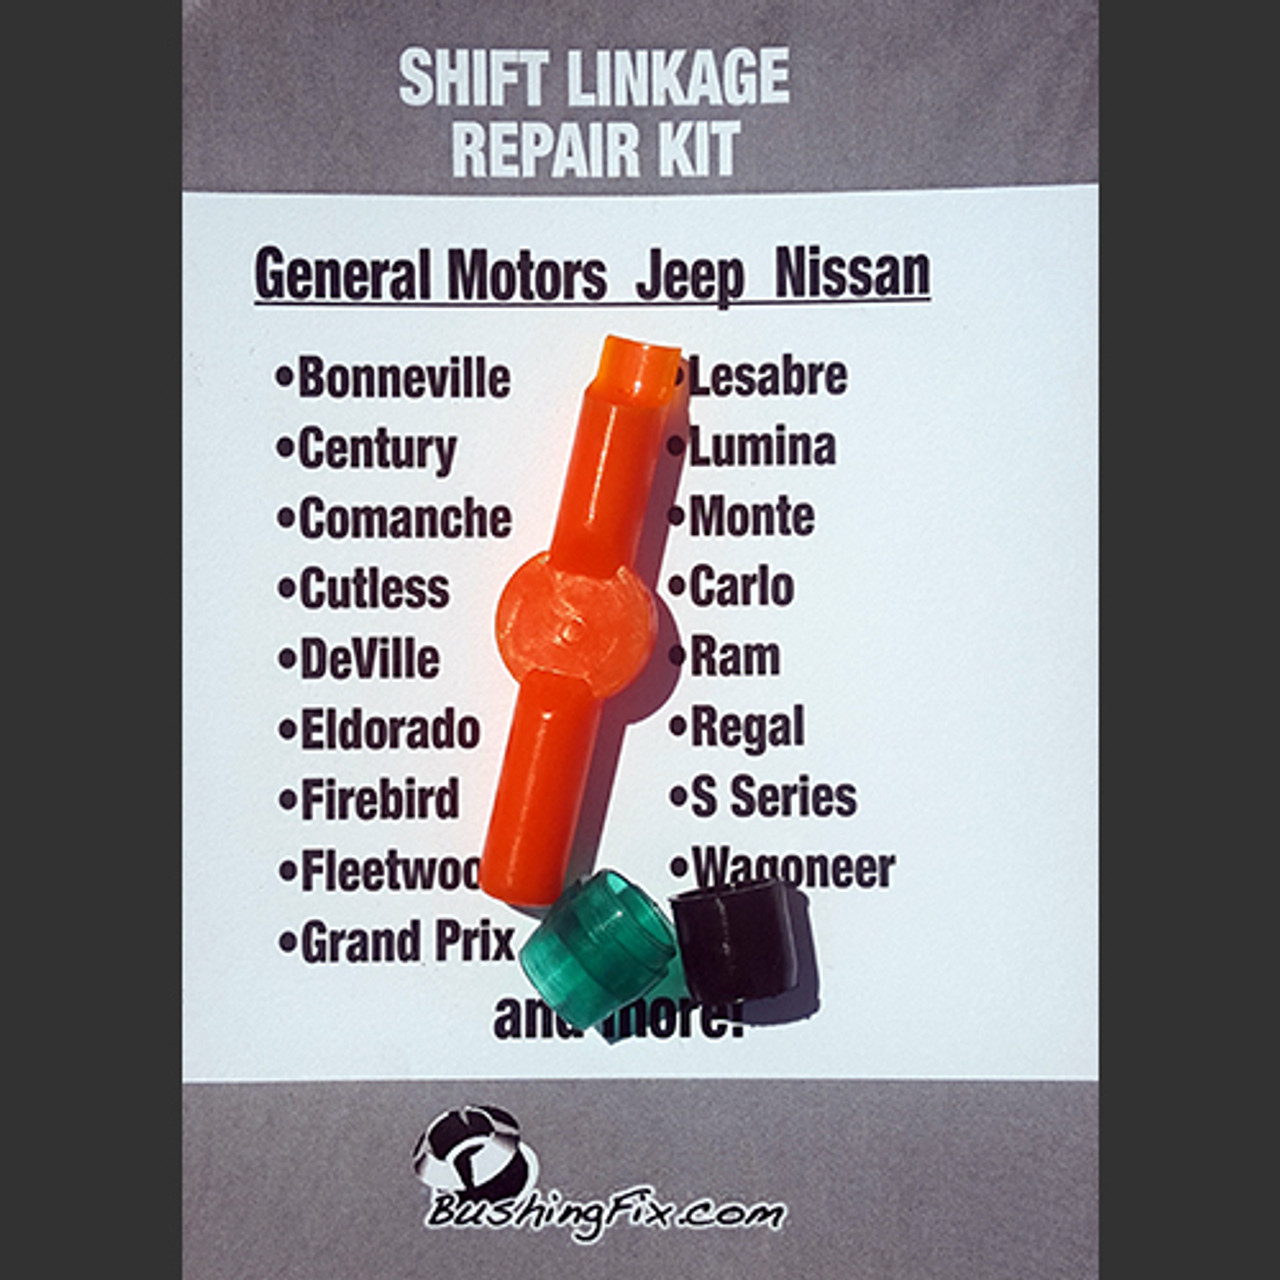 Chevrolet Monte Carlo bushing repair kit